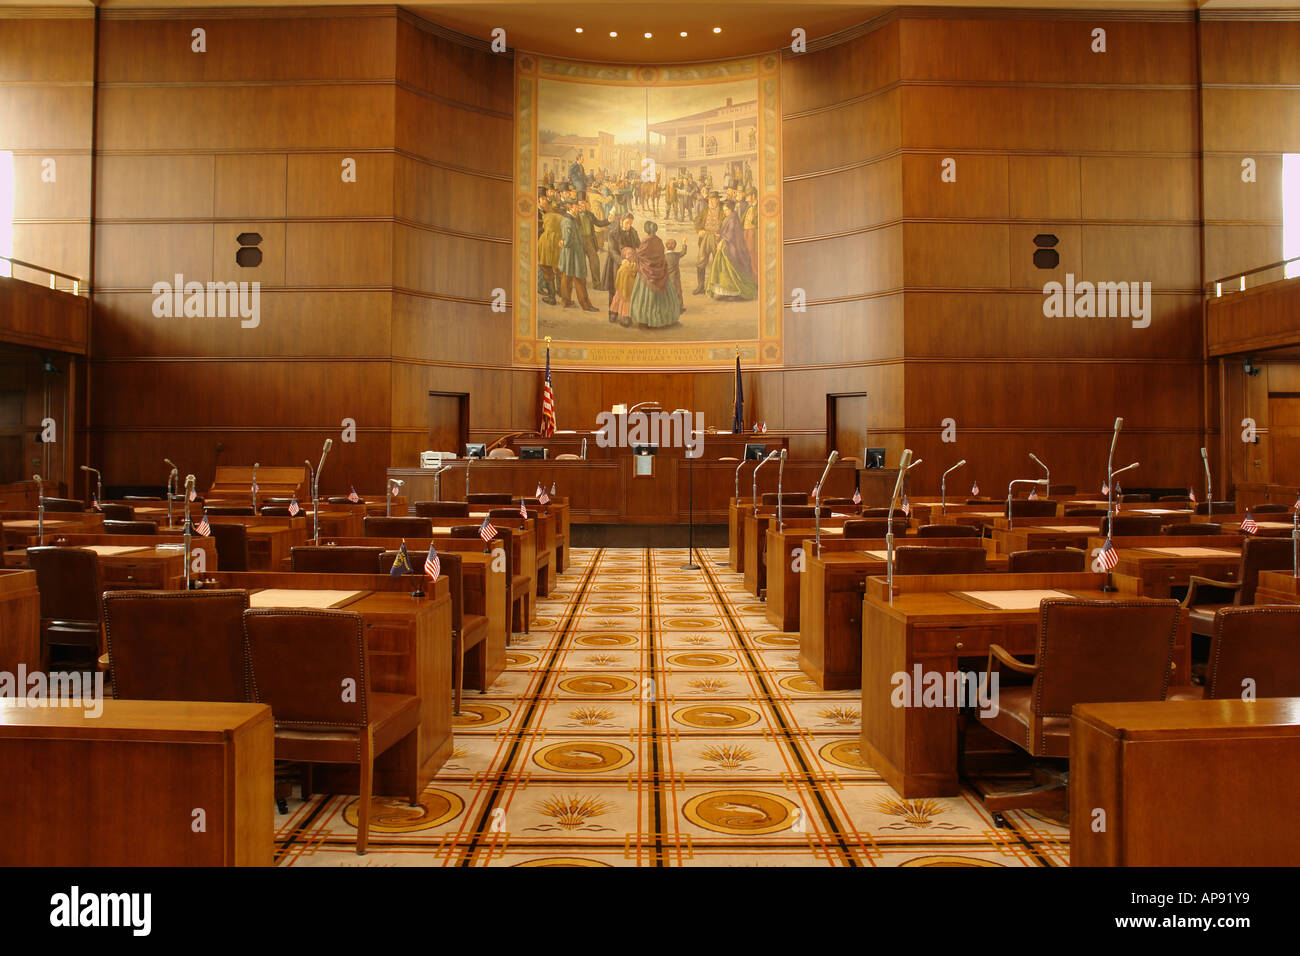 AJD52098 Salem OR Oregon State Capitol interior Stock Photo